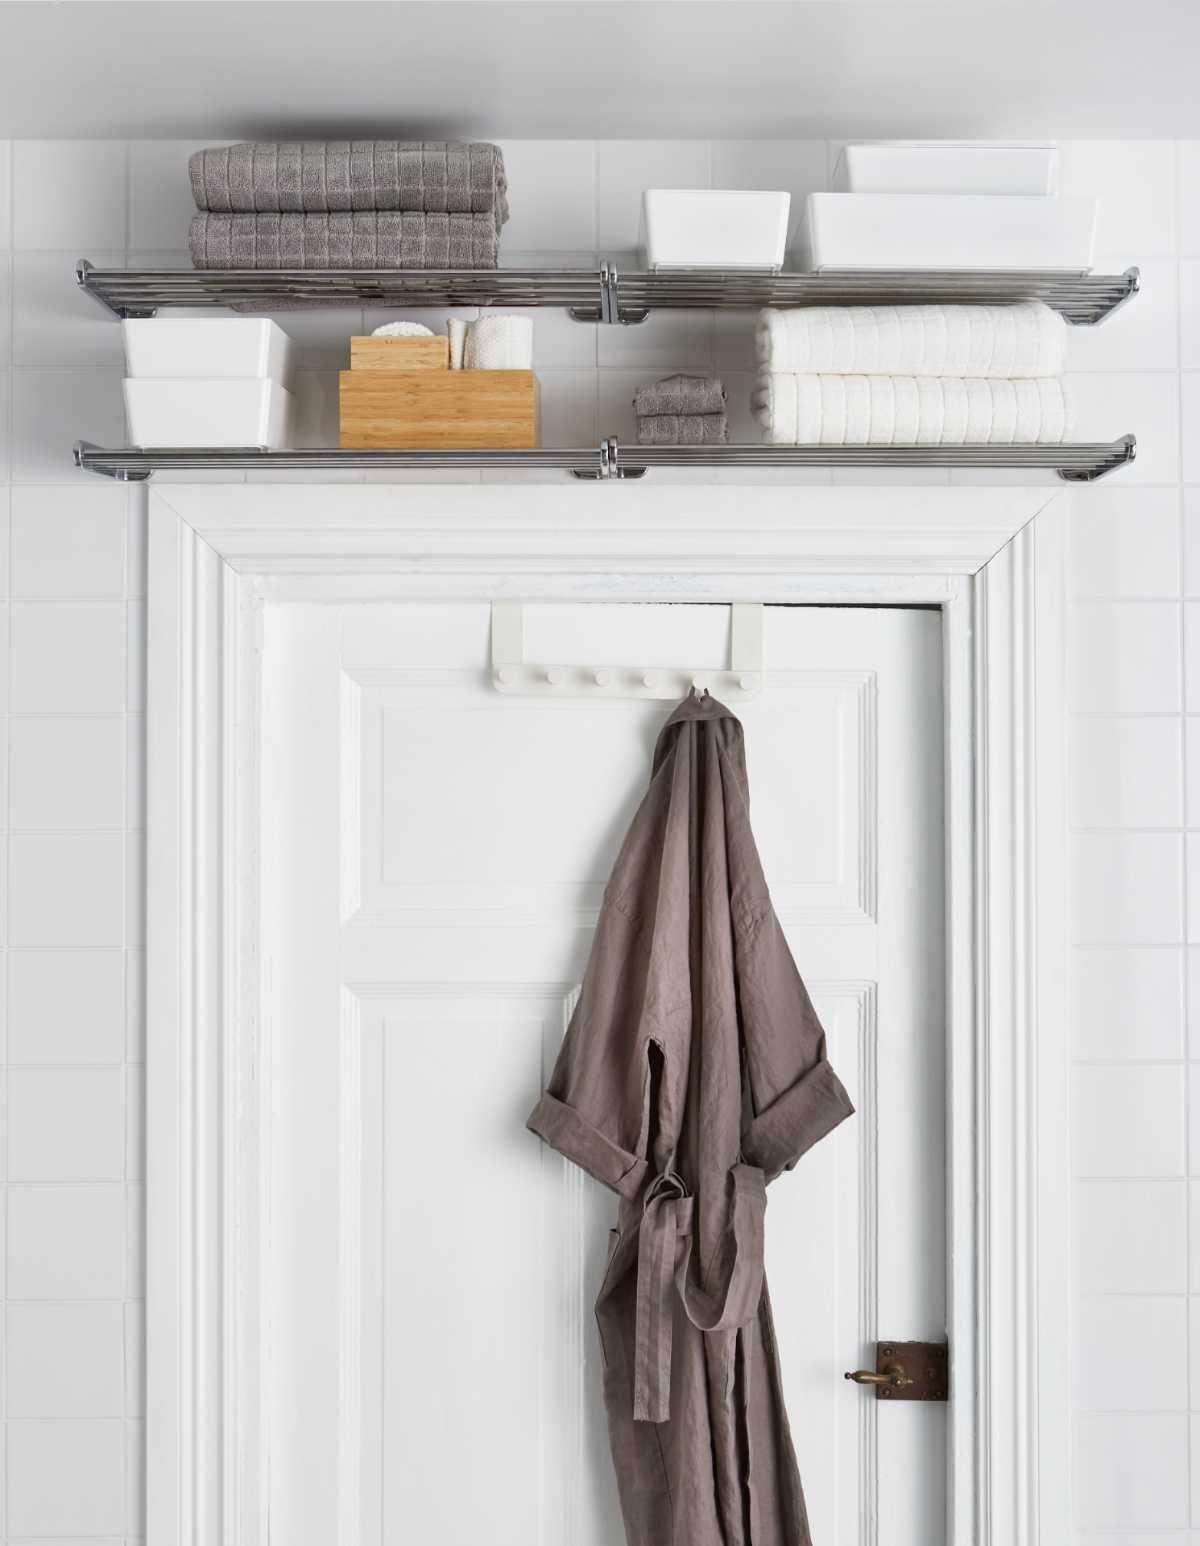 Estantes sobre la puerta de baño